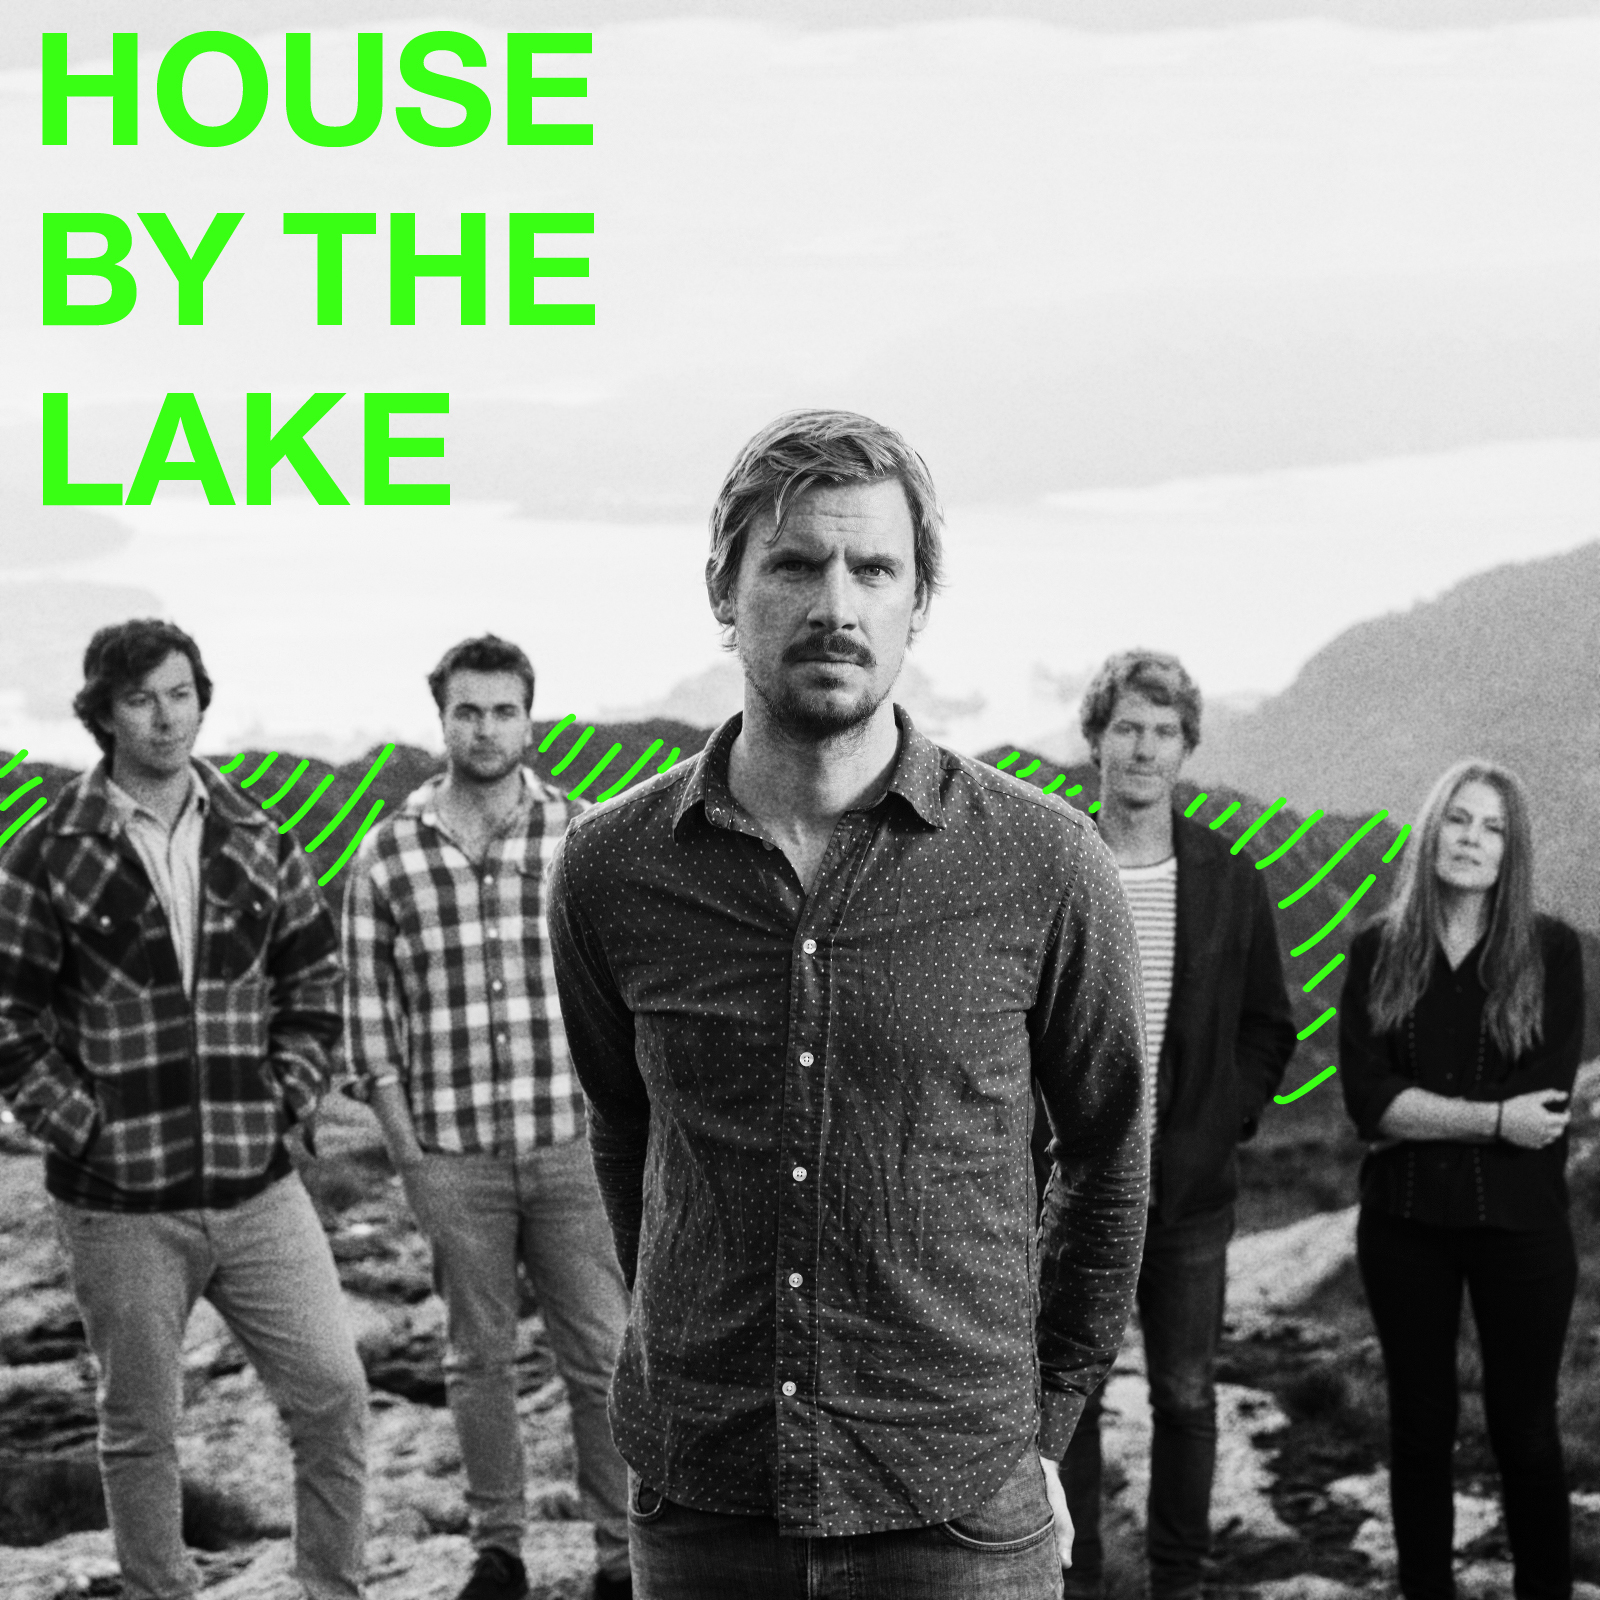 vvv__house by the lake.jpg